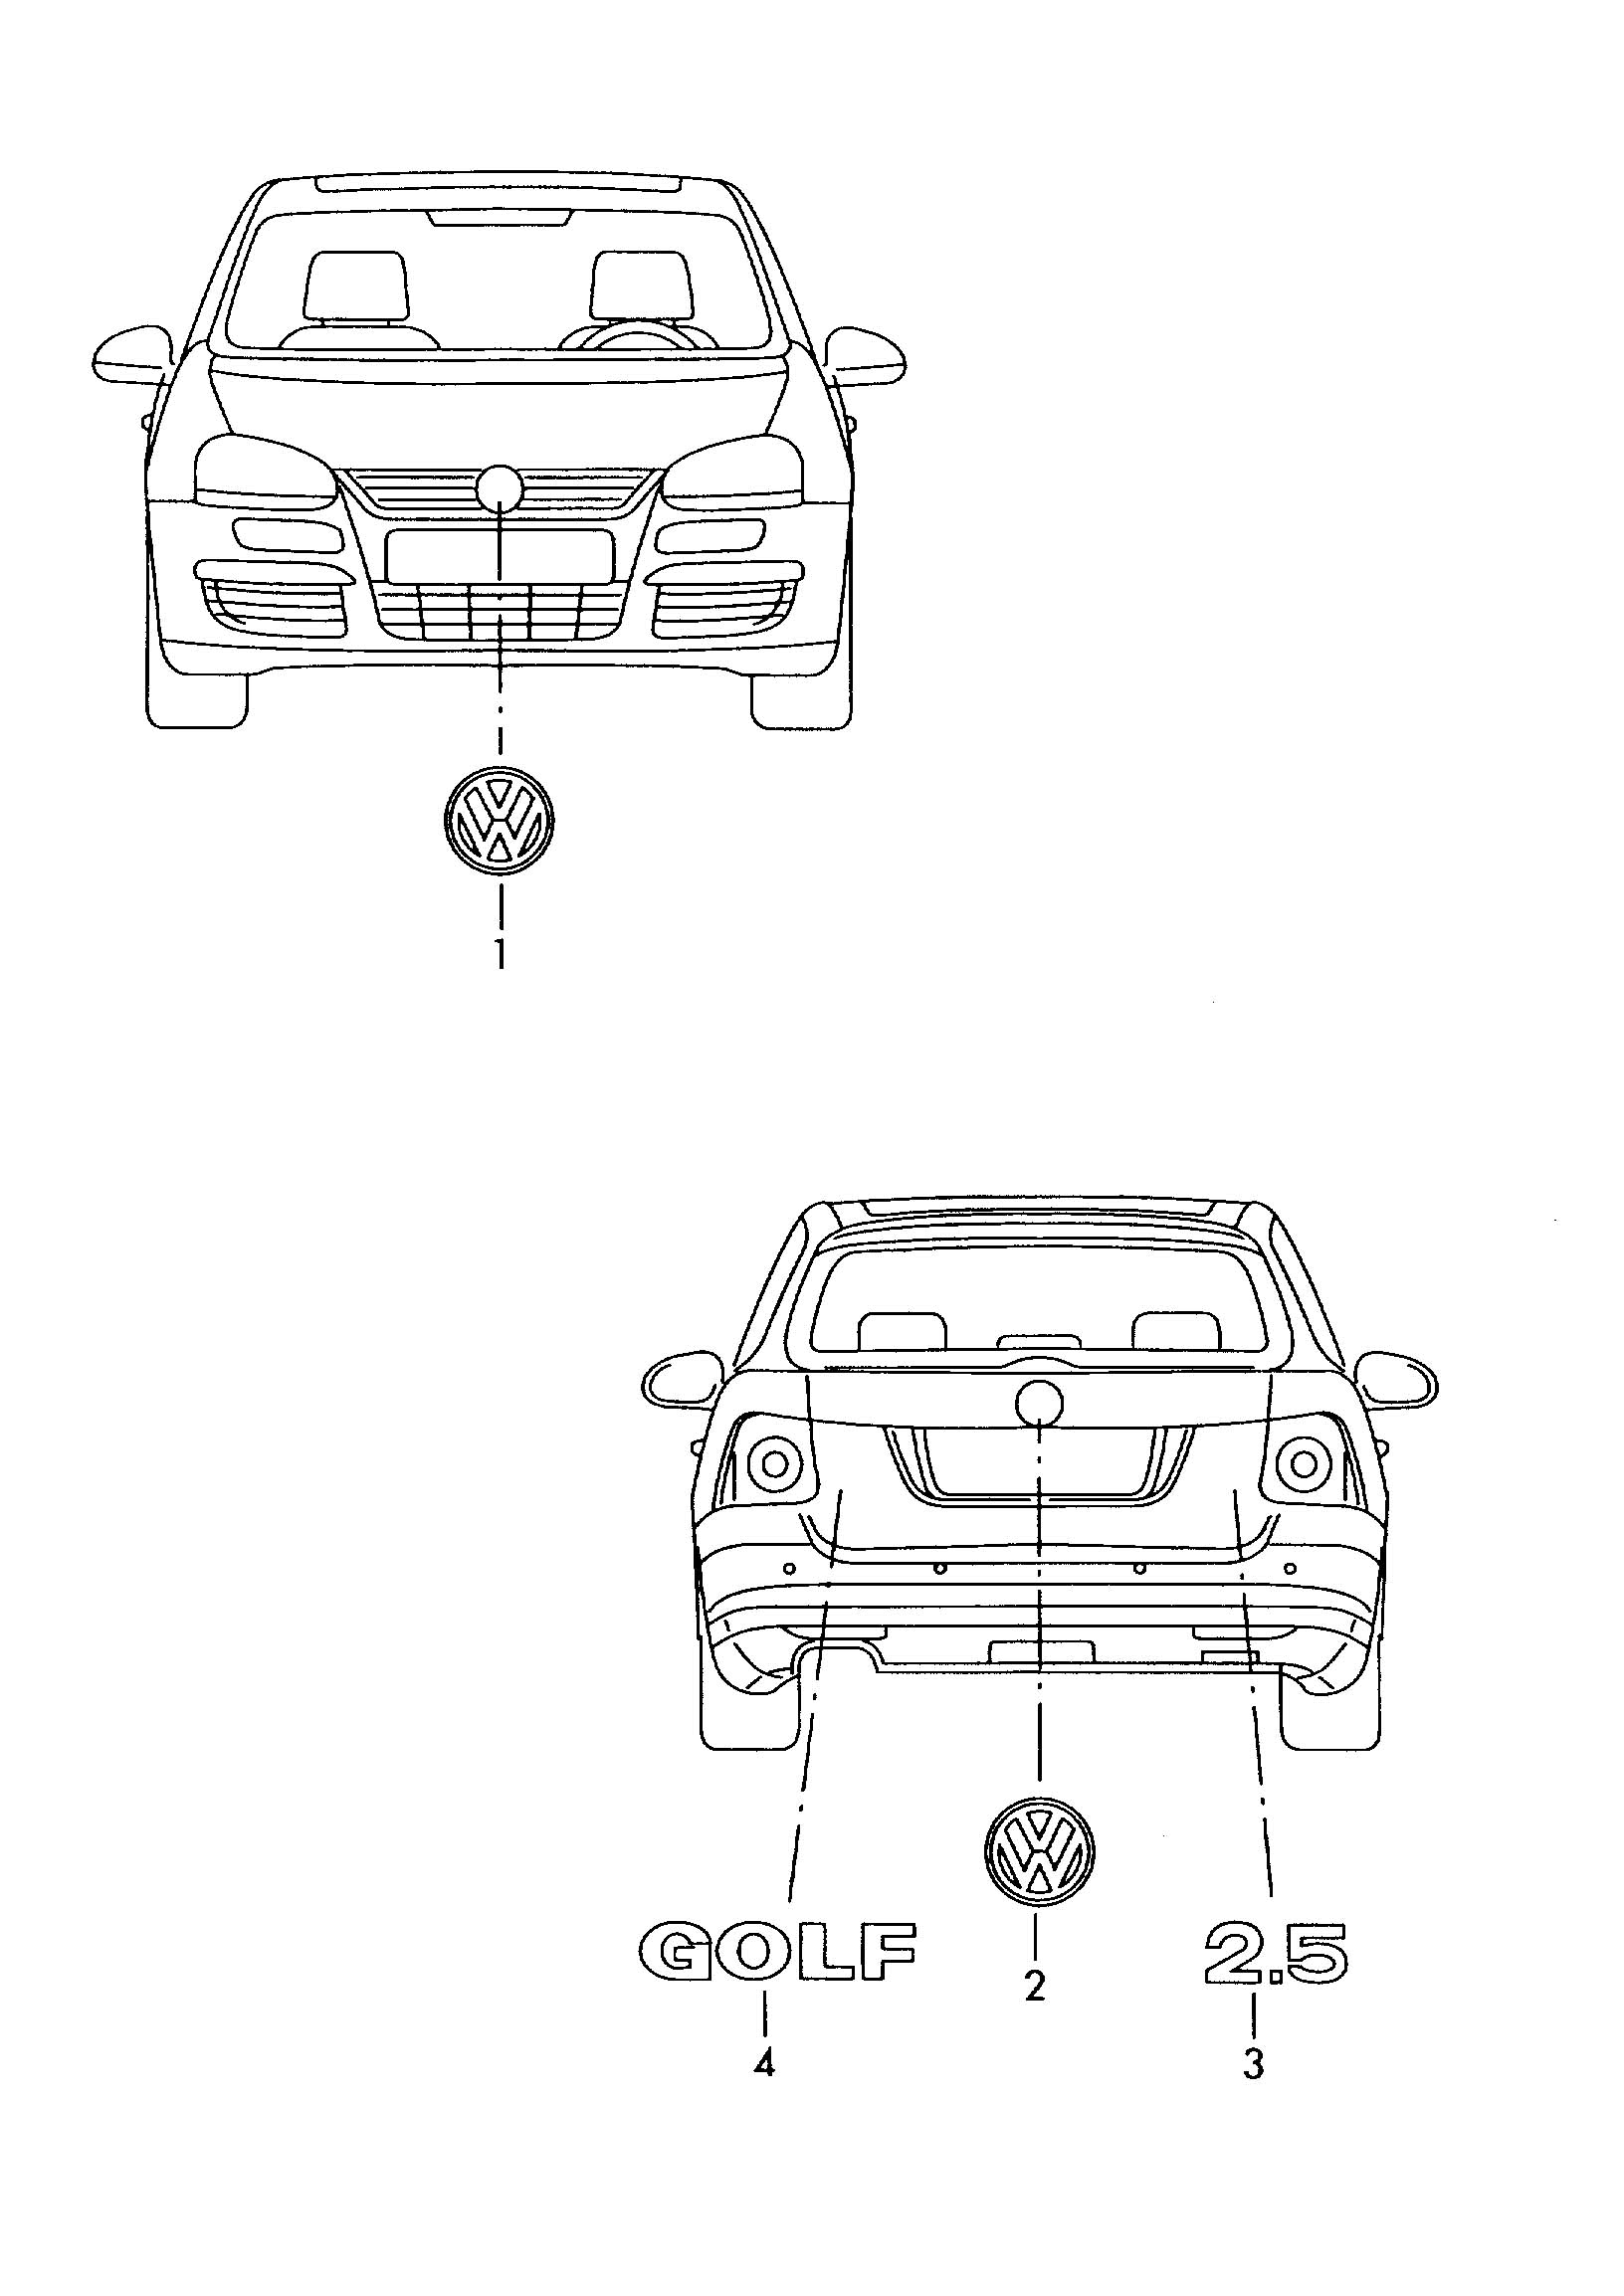 Volkswagen Golf Variant Chrome Silver